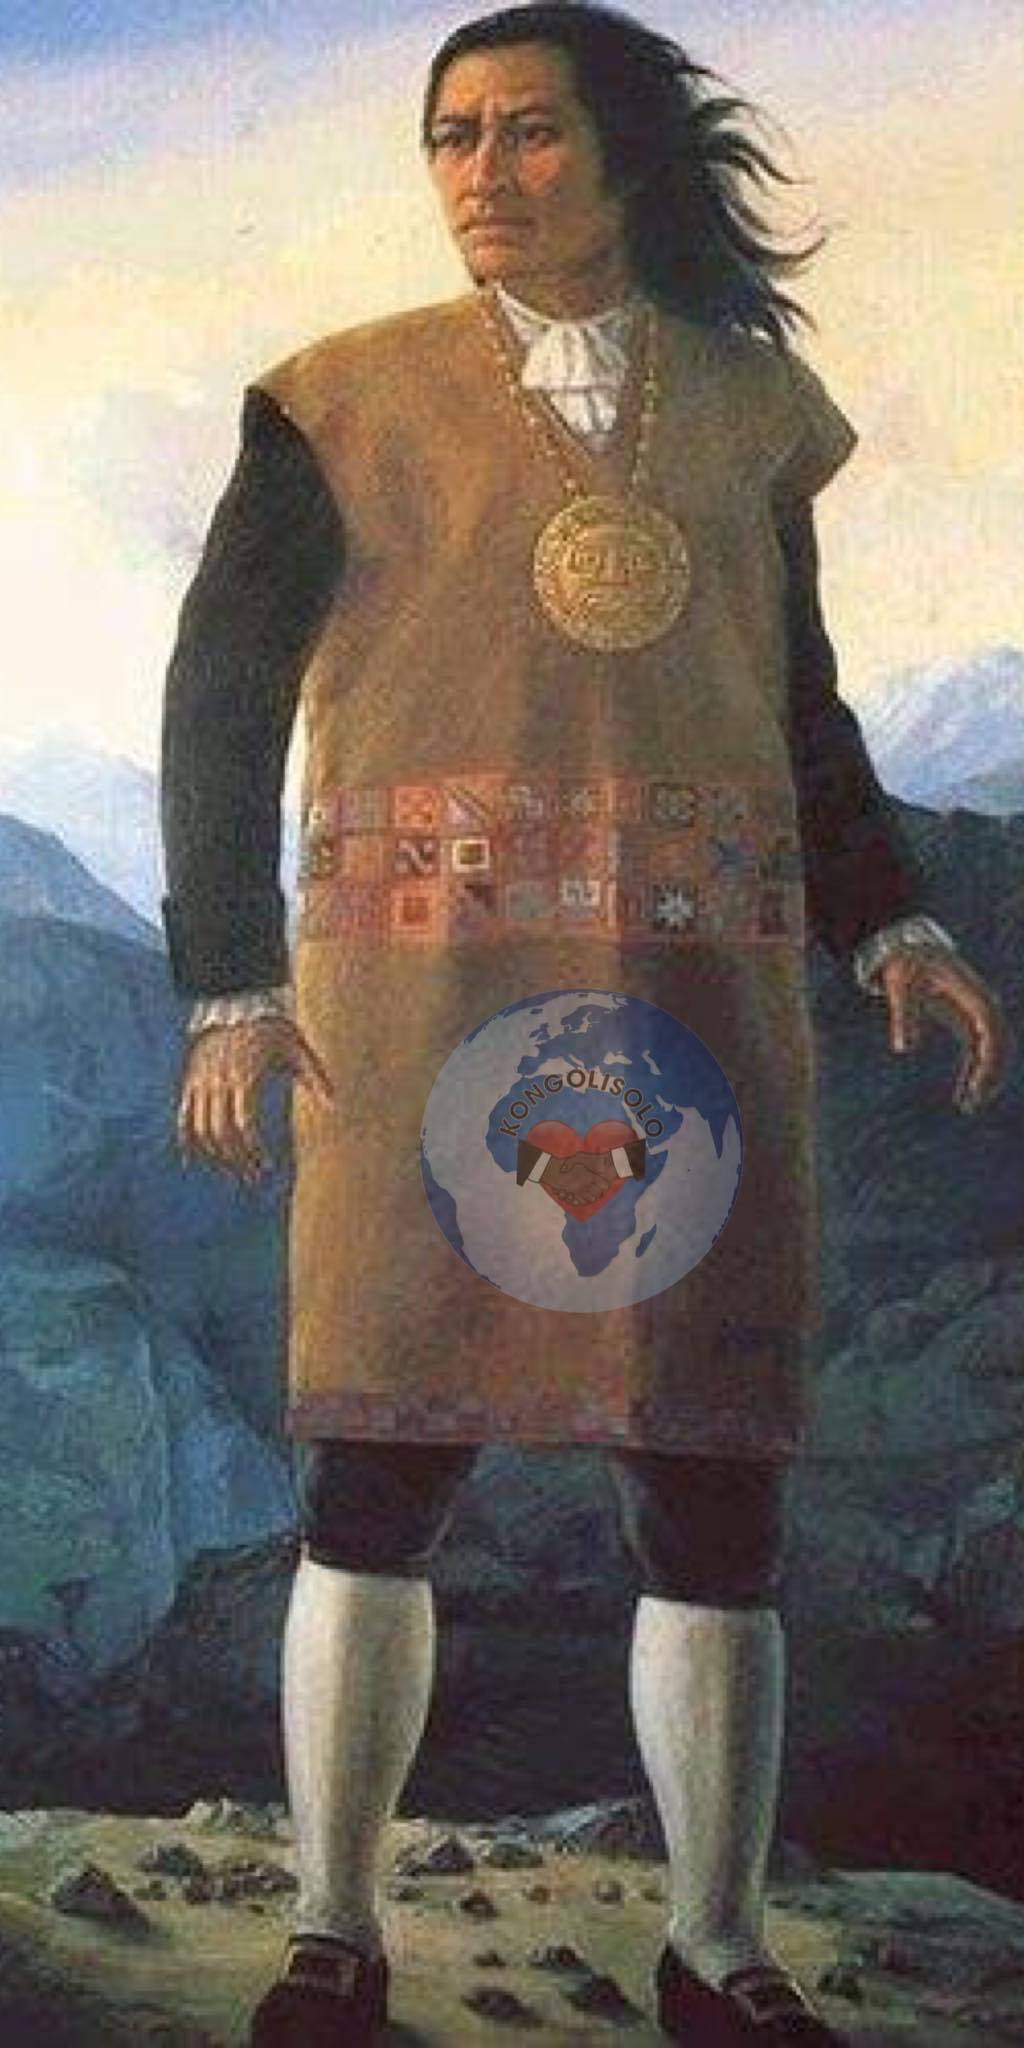 José Gabriel Túpac Amaru (Surimana, Canas, vice-royauté du Pérou,19 mars 1738 – Cuzco, 18 mai 1781)